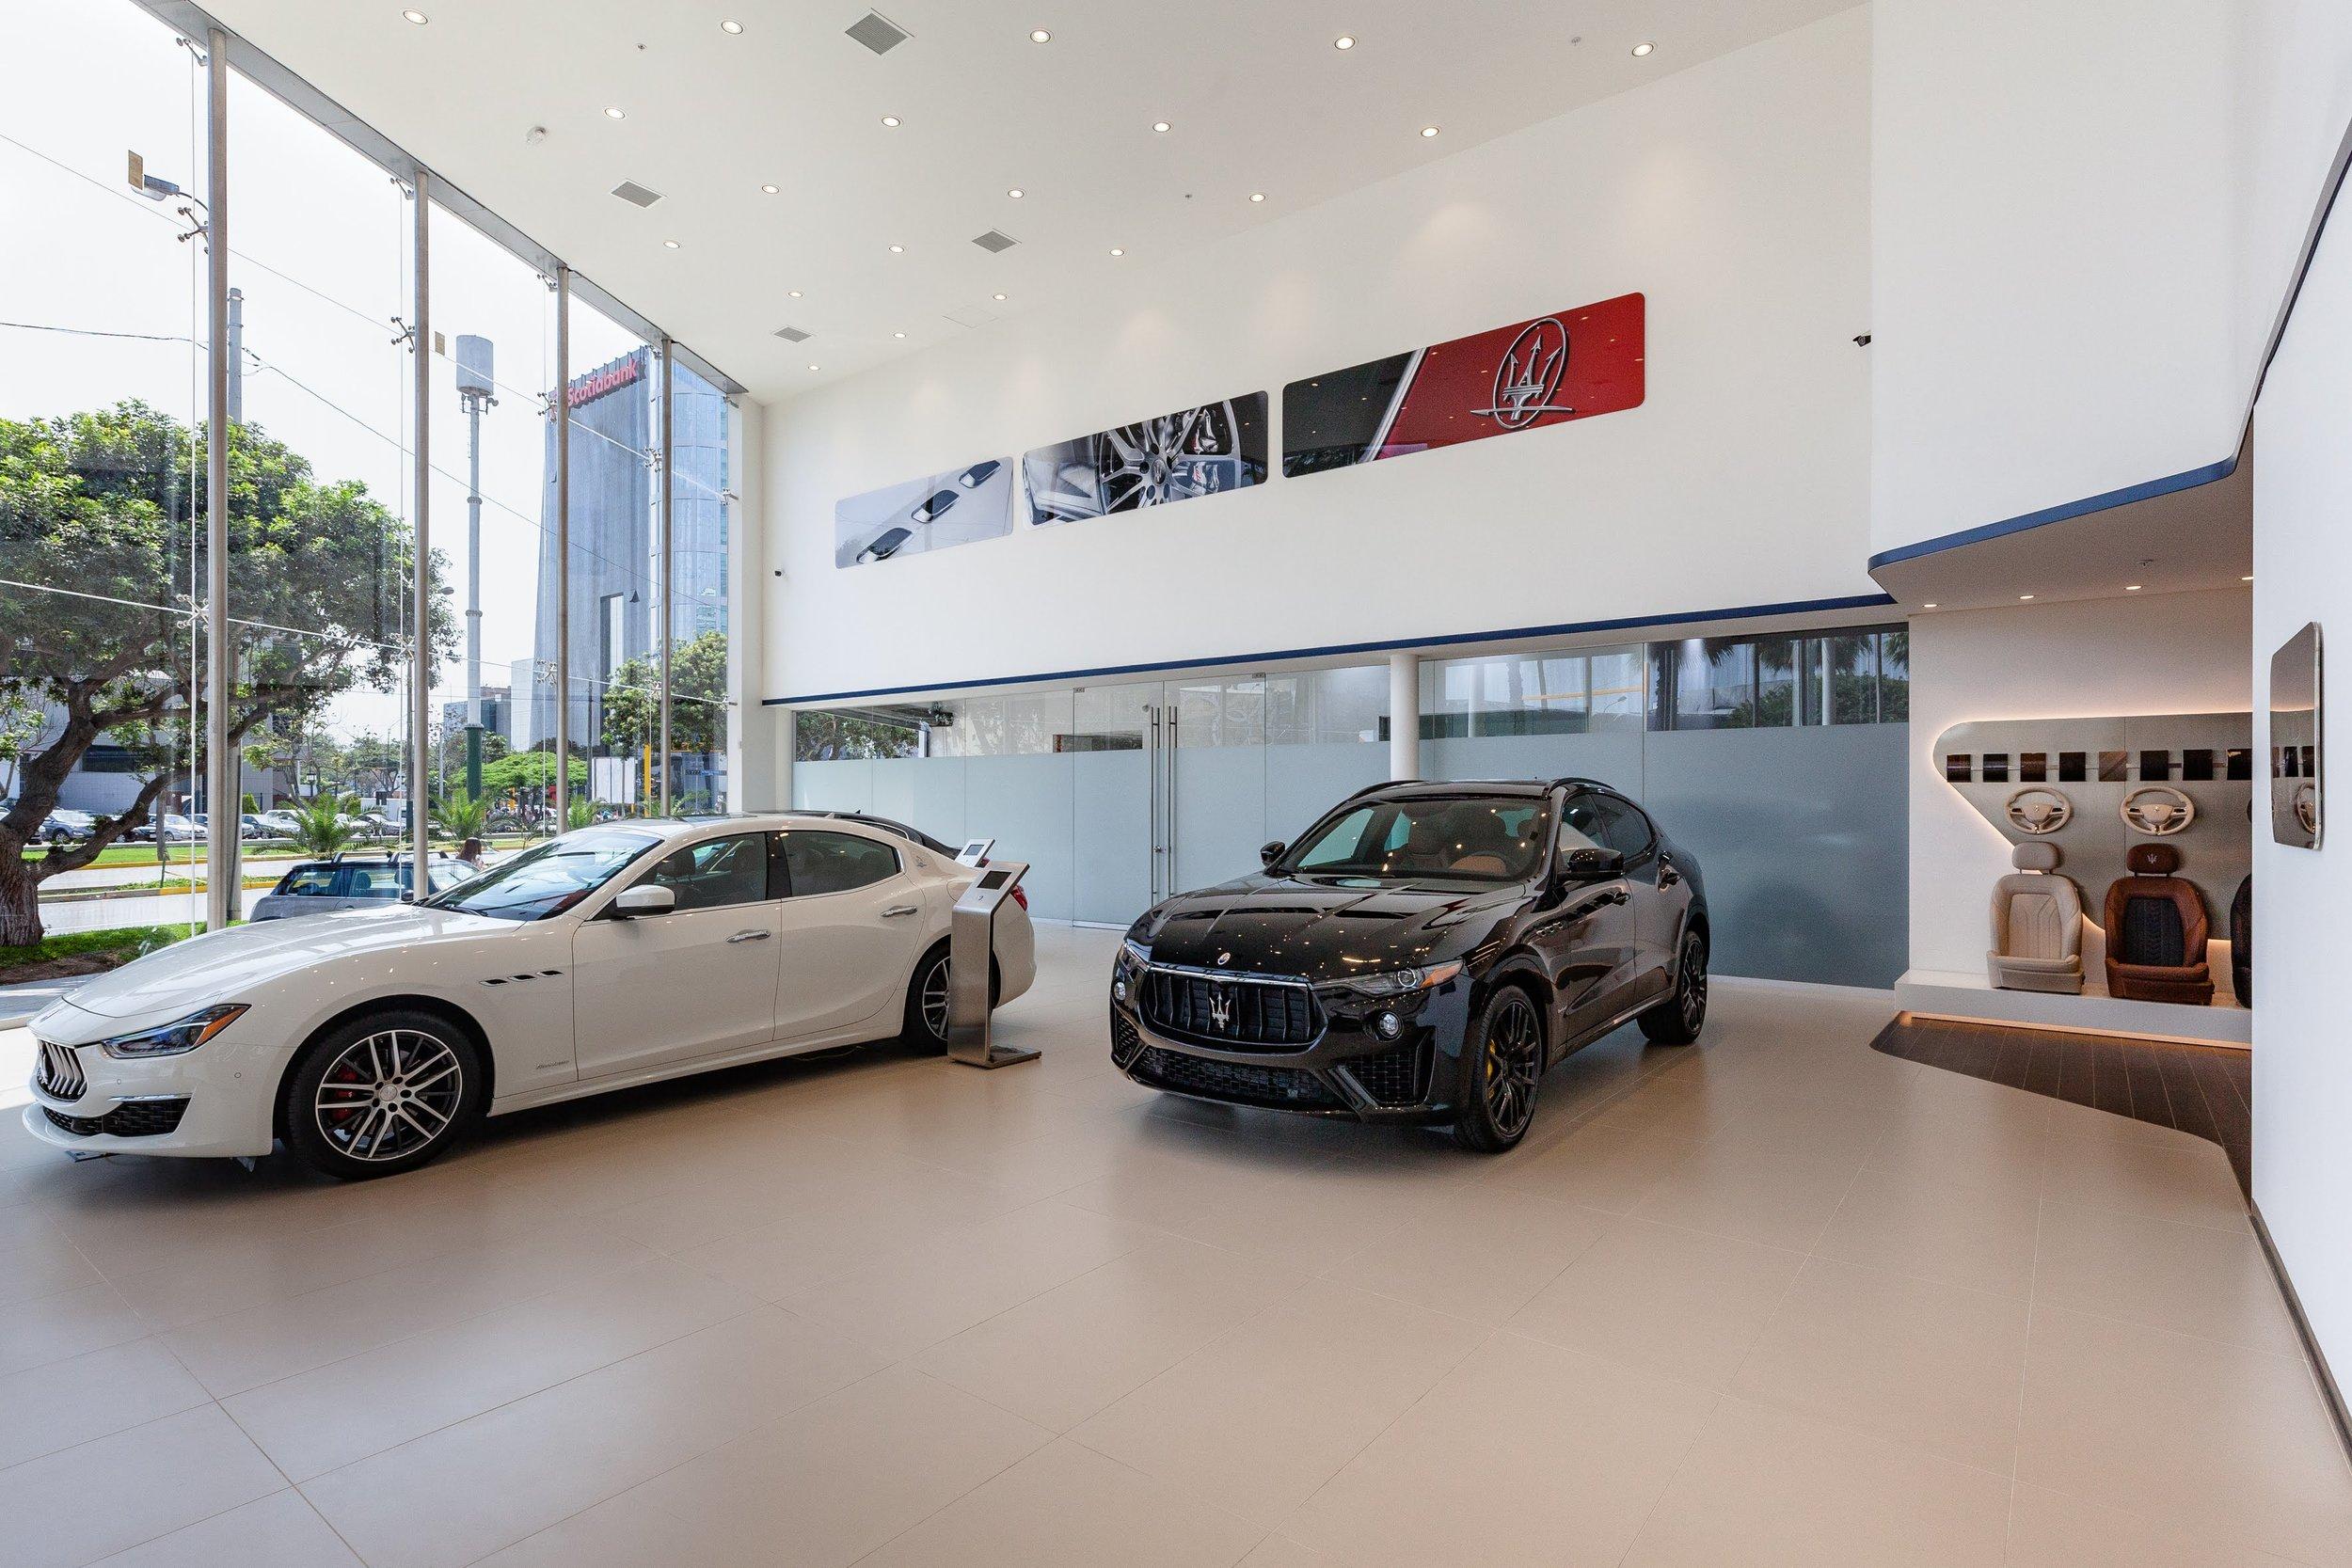 20181219-DRRP-PE-Fotos-Maserati-018.jpg